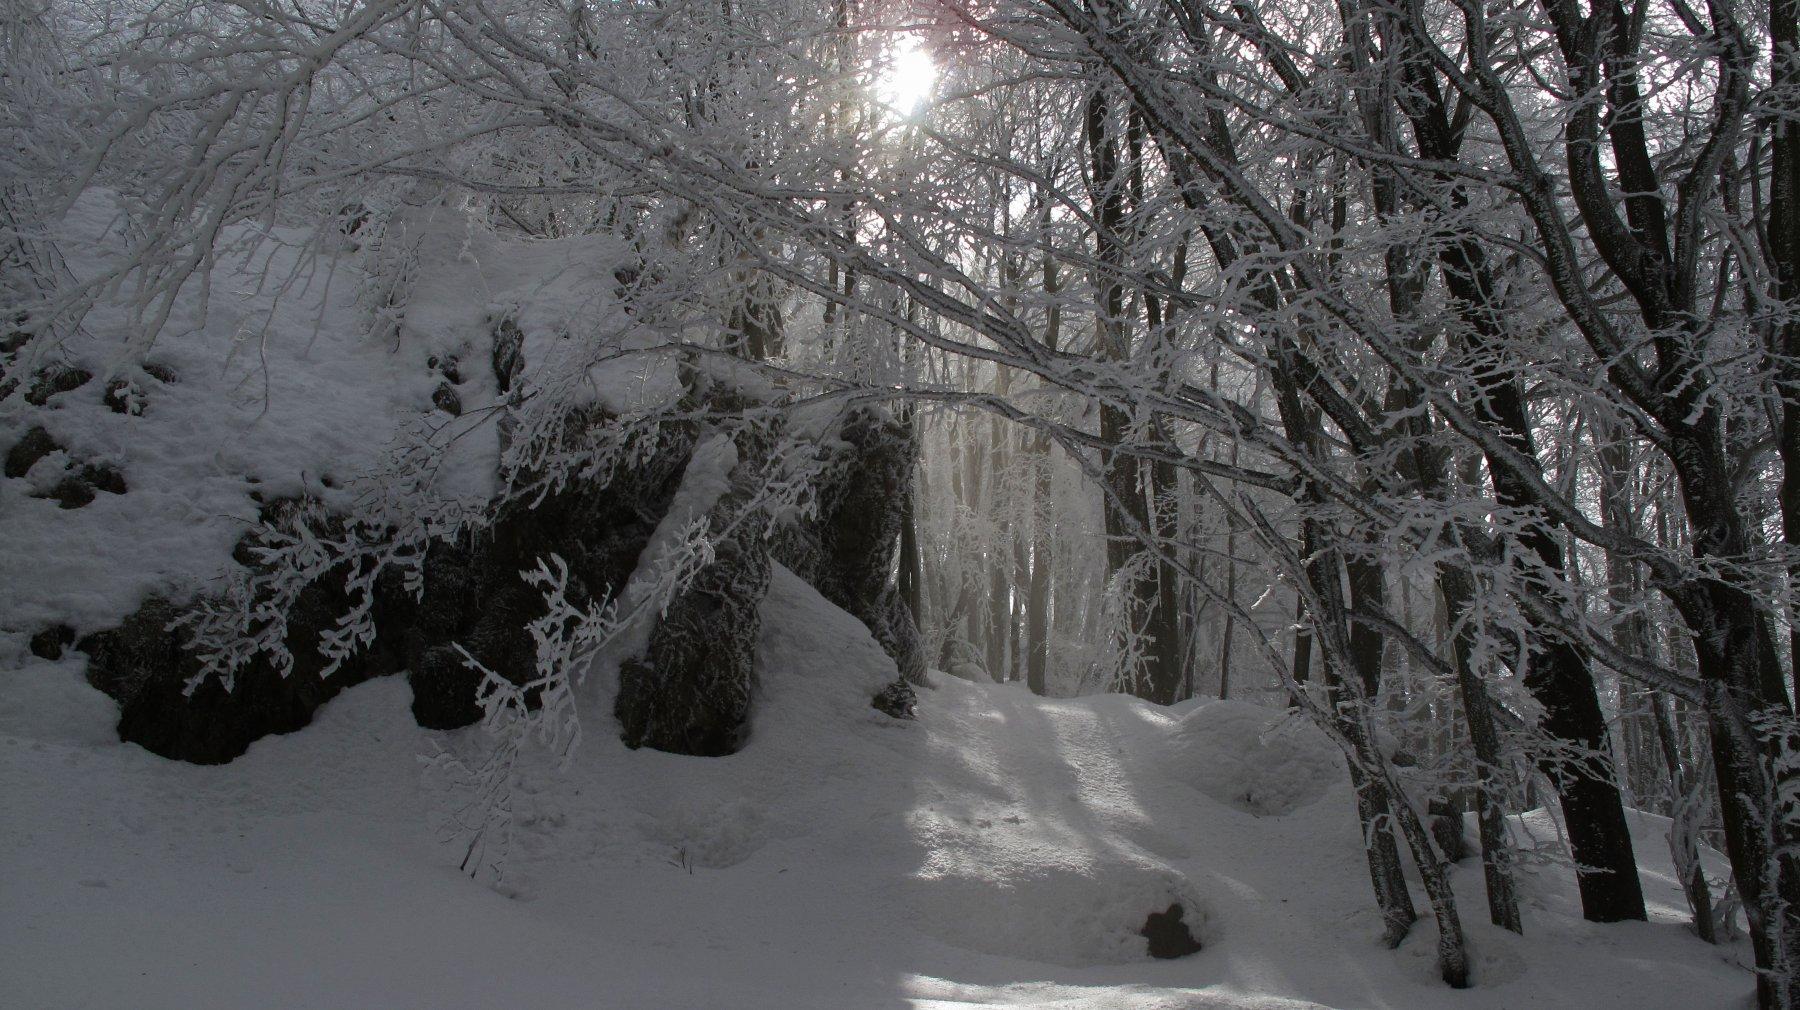 luci bel bosco fiabesco